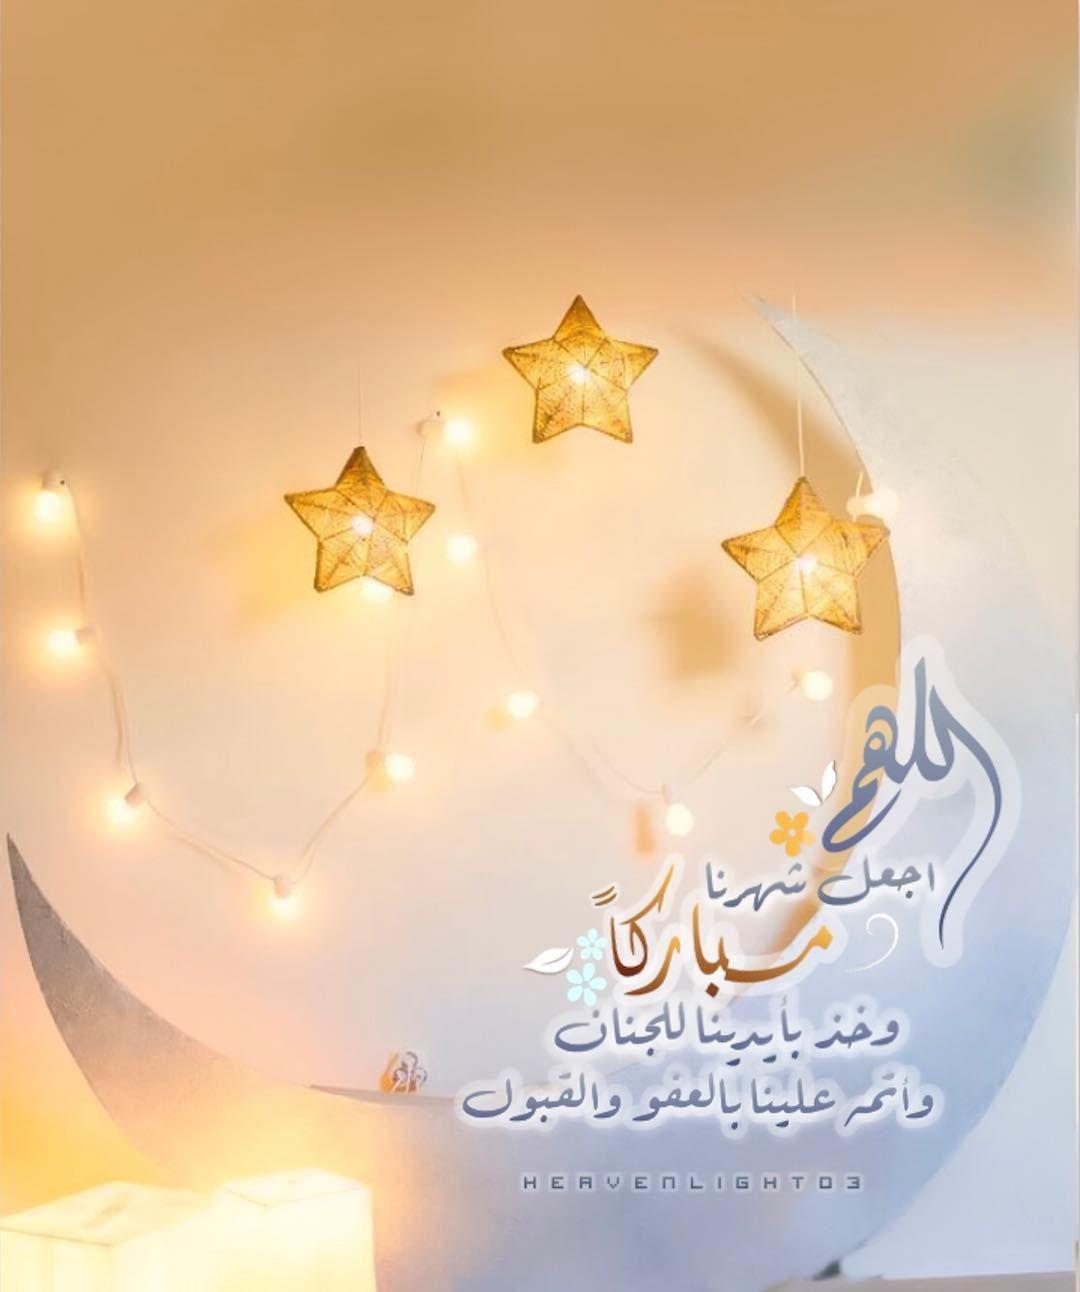 630 Likes 28 Comments Um Rakan Heavenlight03 On Instagram اسق قلوب الصابرين فرحا يا الله Ramadan Decorations Muslim Ramadan Ramadan Kareem